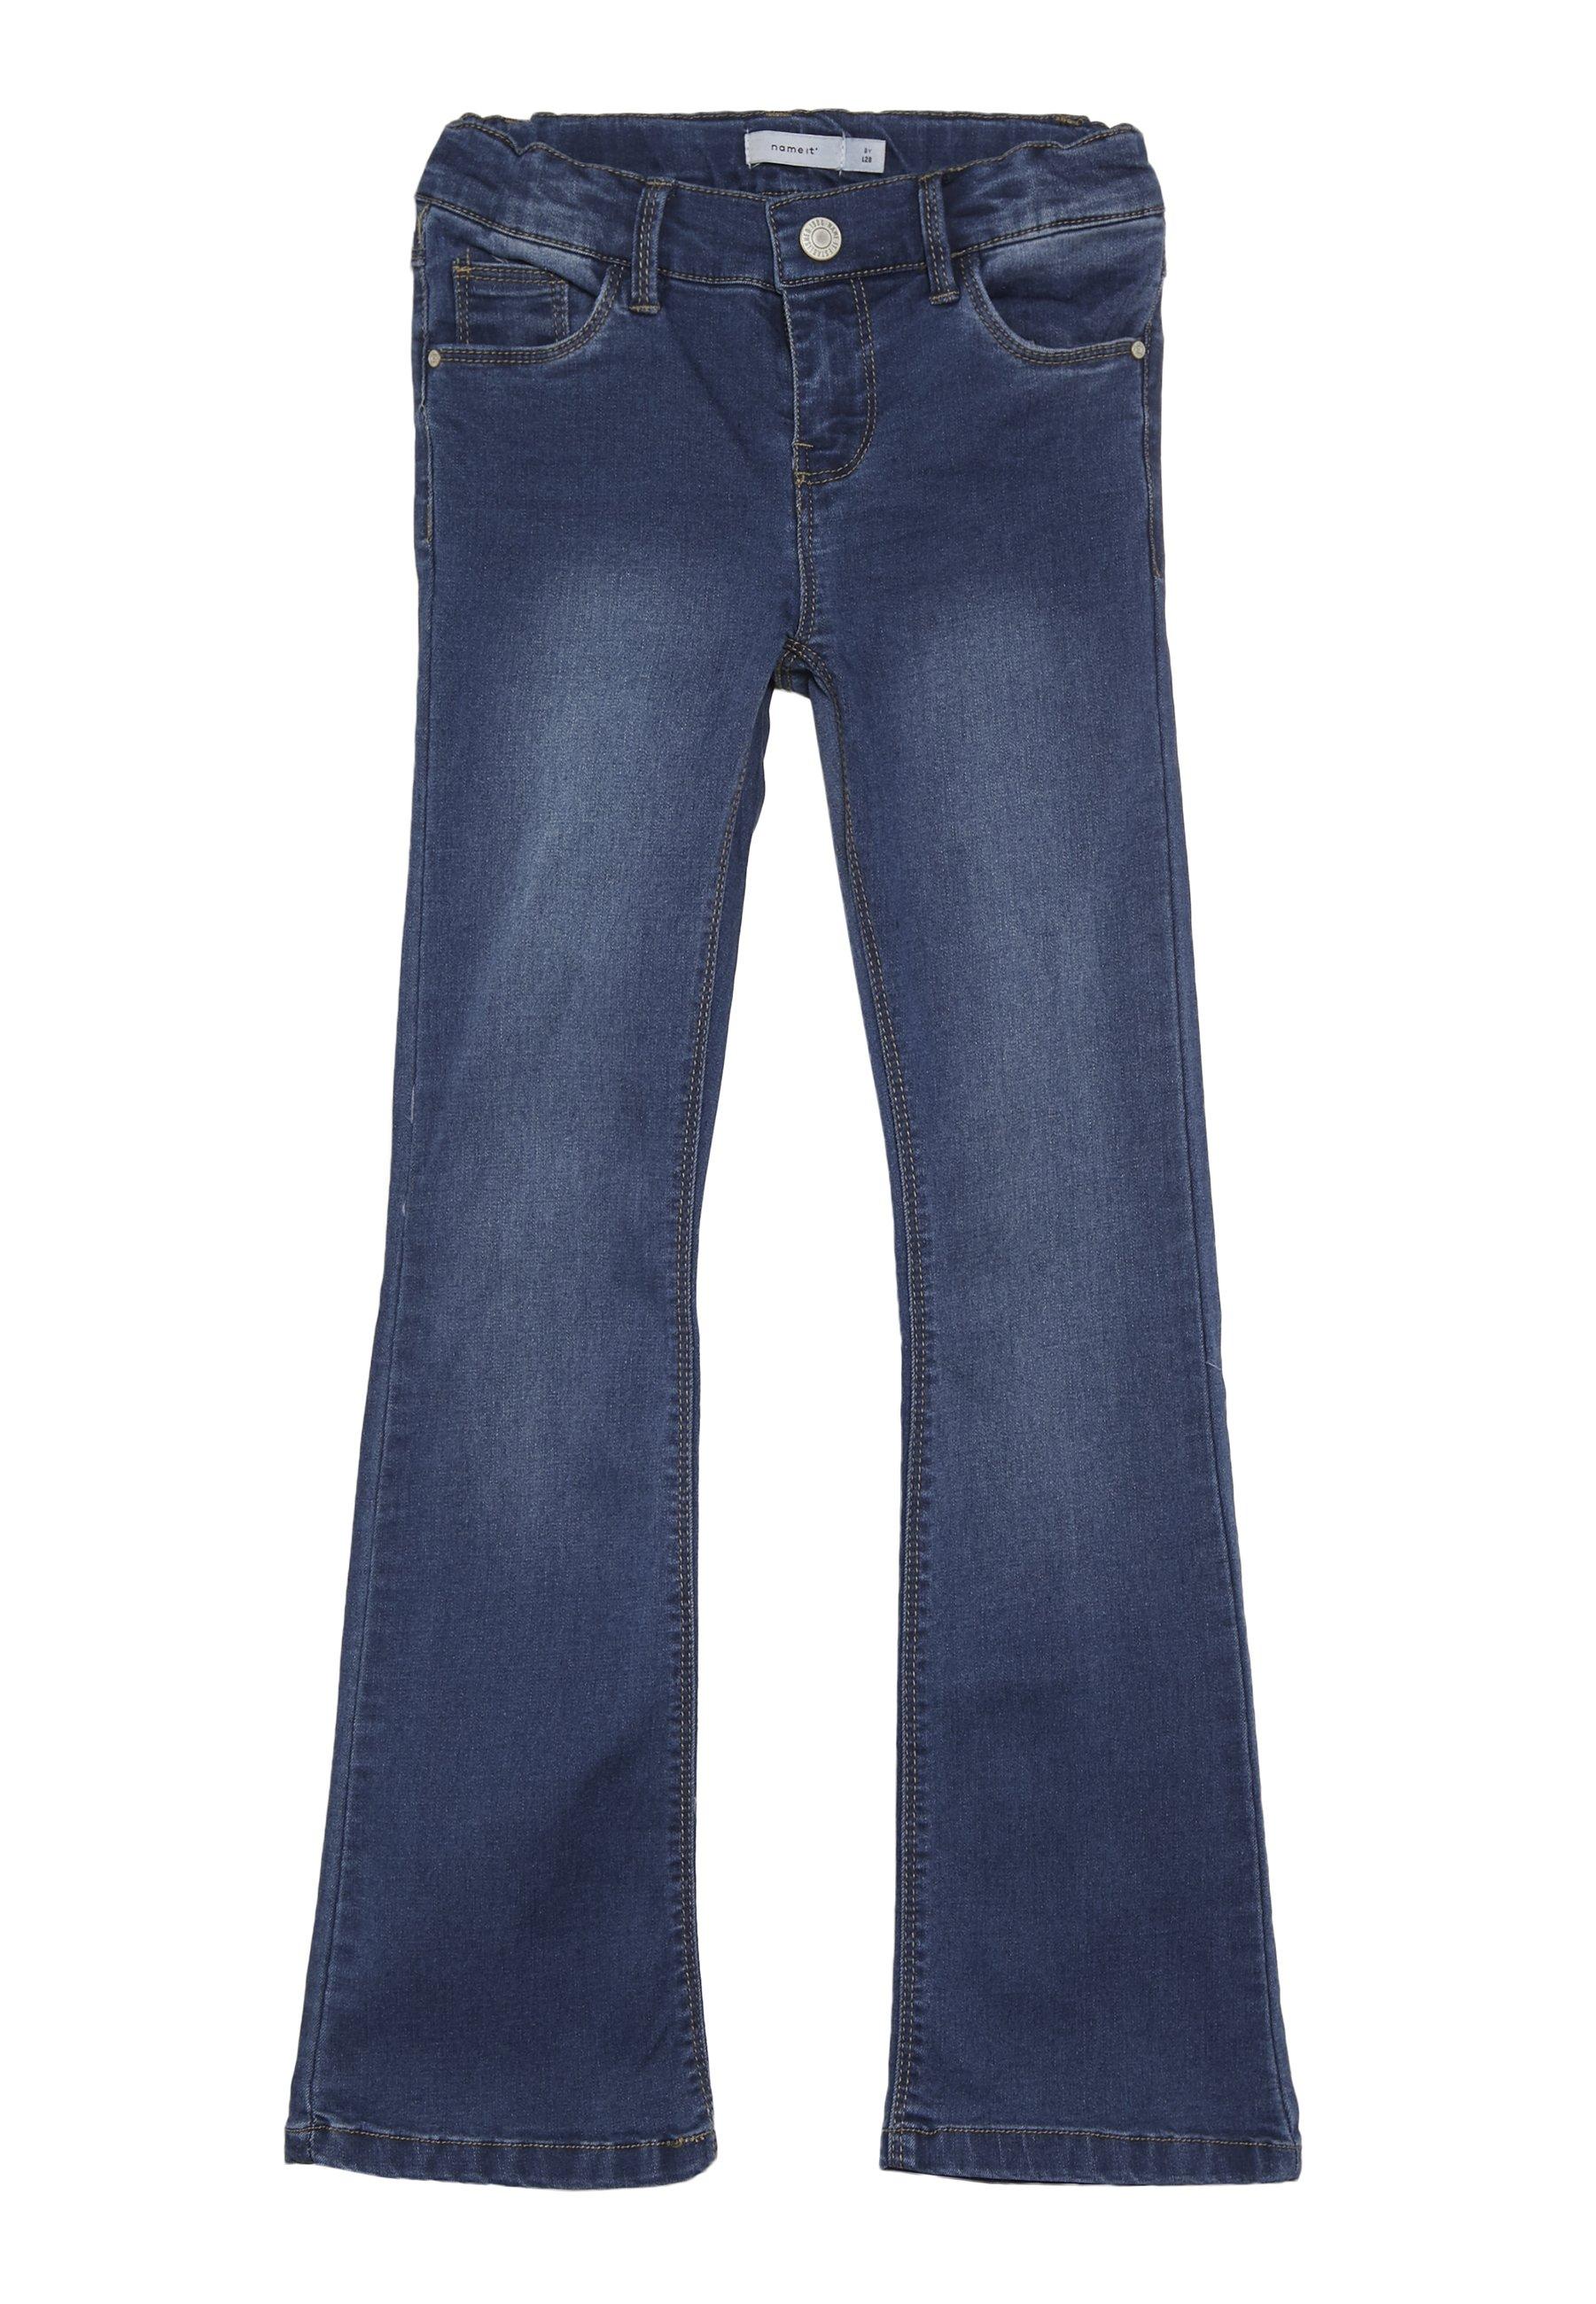 Kids NKFPOLLY DNMINDIGO BOOTCUT  - Bootcut jeans